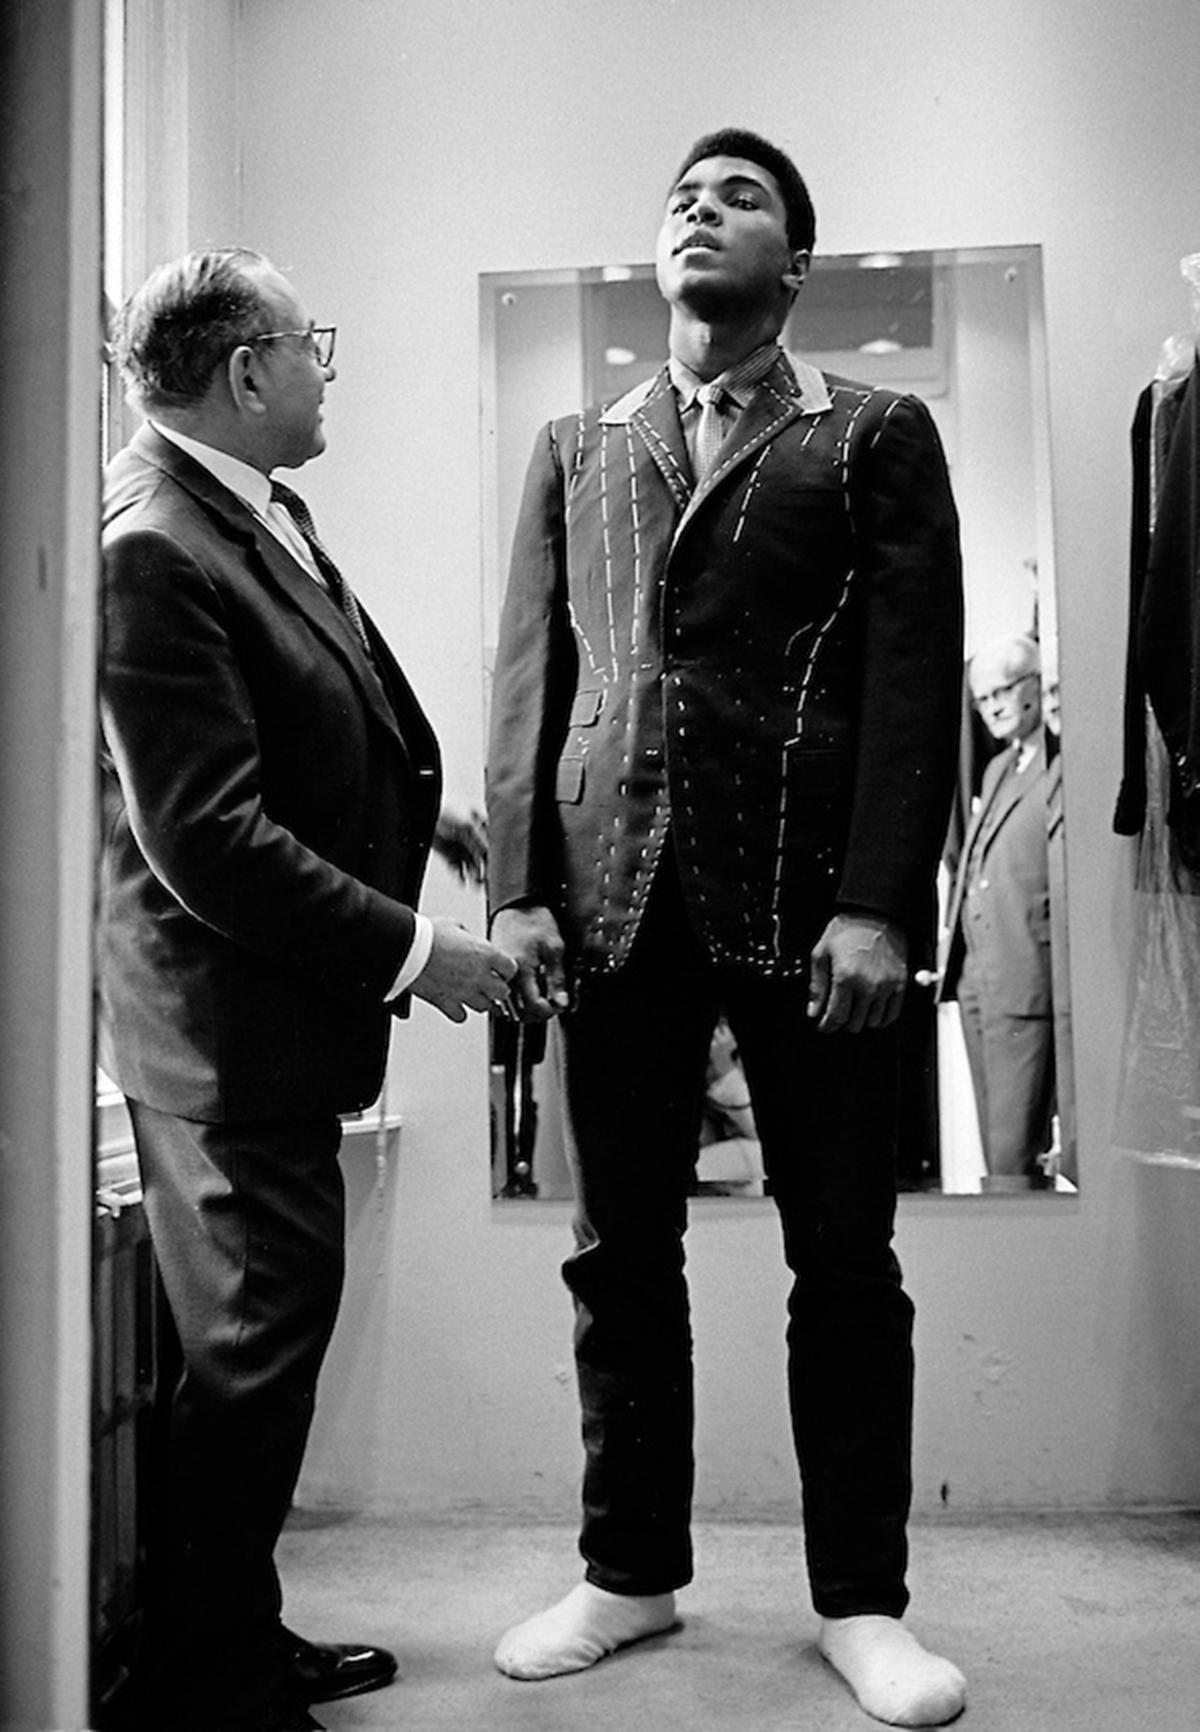 01 Muhammad Ali is measured for a bespoke suit by a tailor in londonÔÇÖs Savile Row, 1966 ÔÇó Thomas Hoepker